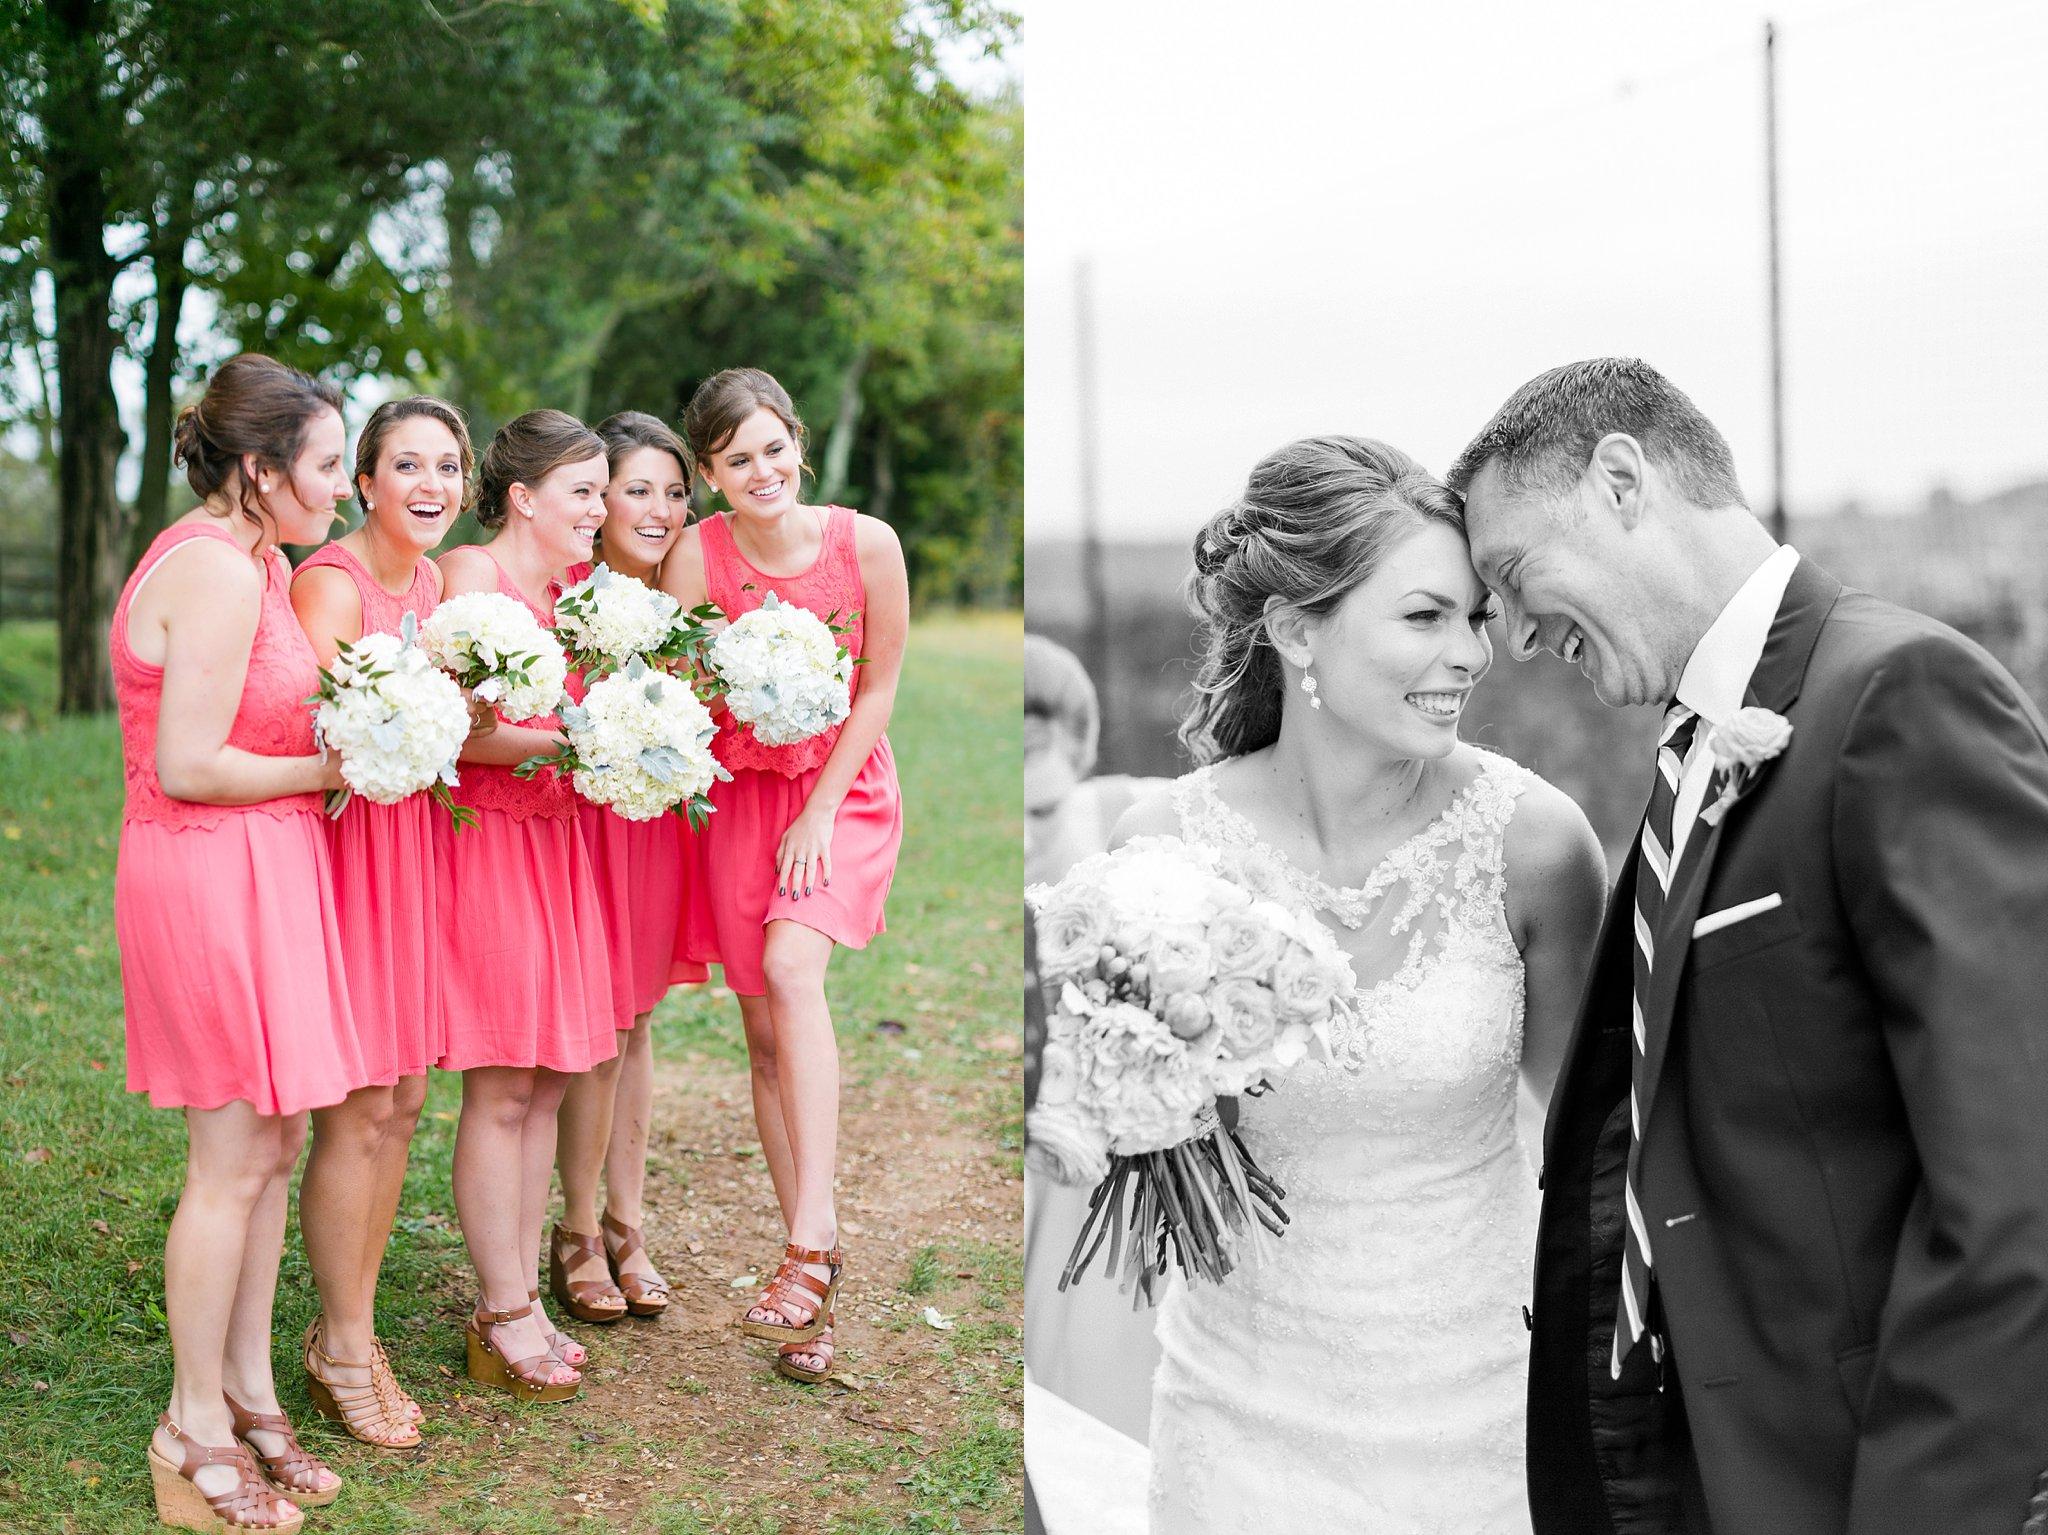 Stone Tower Winery Wedding Photos Virginia Wedding Photographer Megan Kelsey Photography Sam & Angela-175.jpg